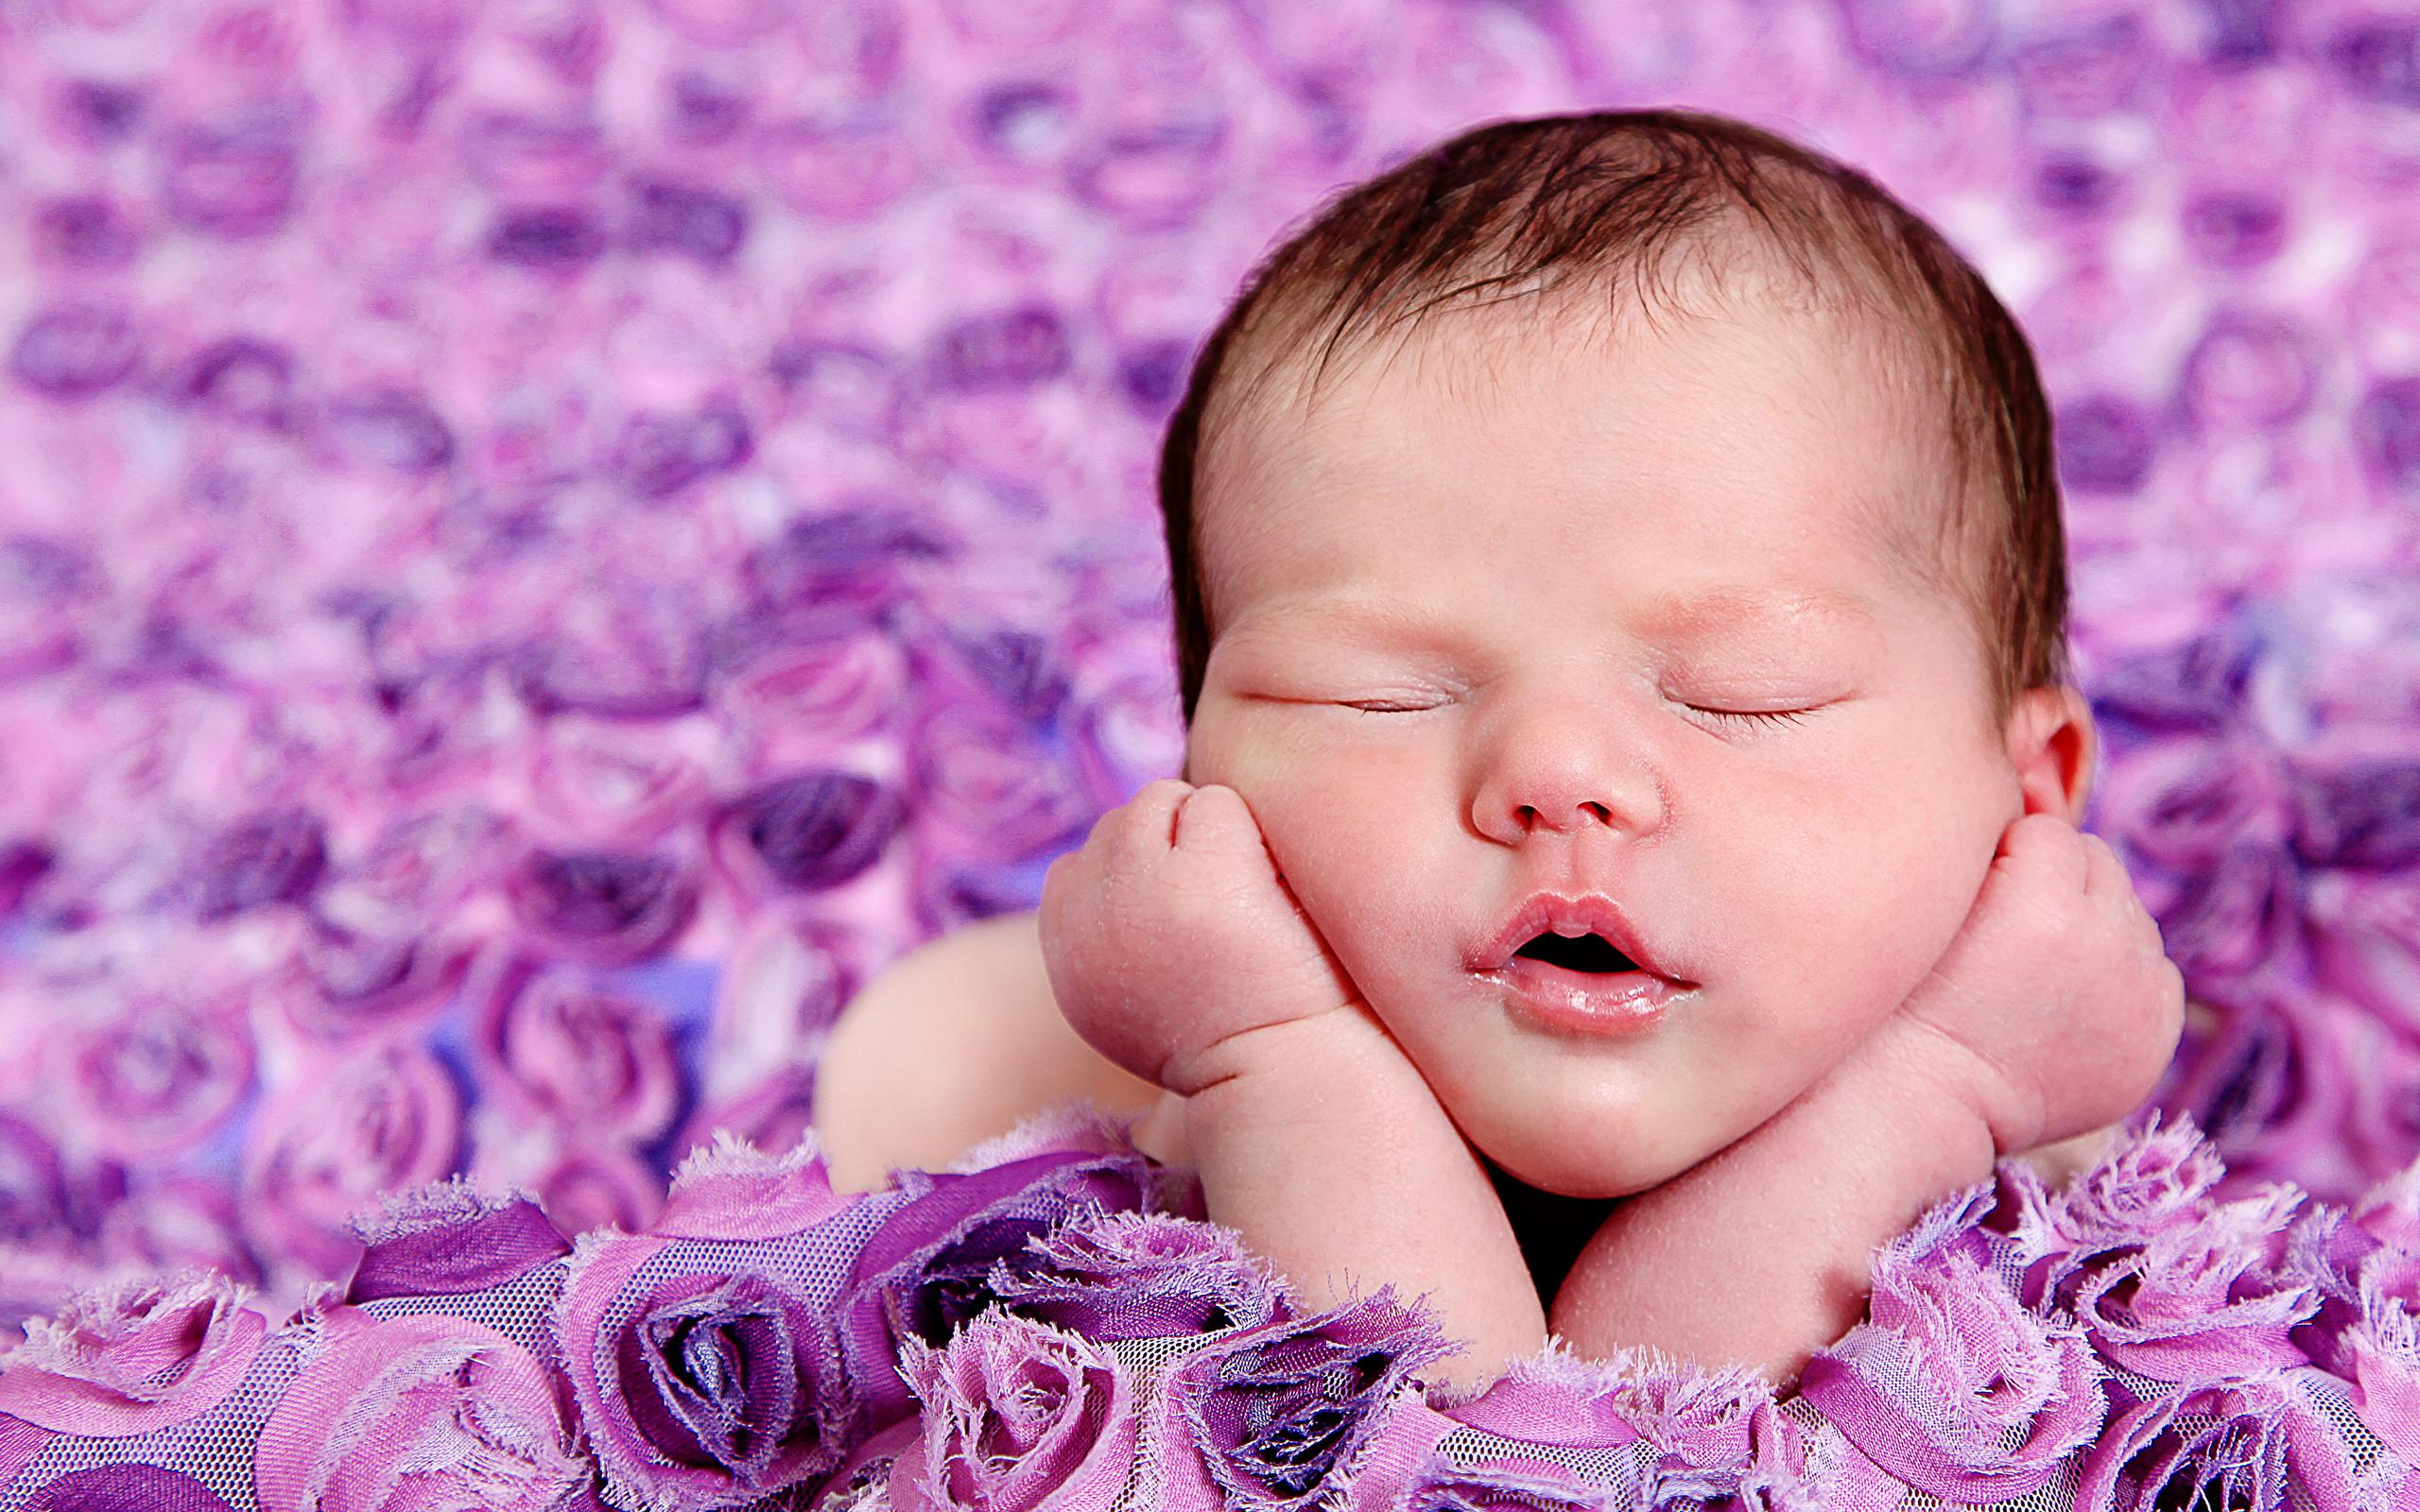 4k Sleeping Babies Desktop Wallpaper For Pc - Funny Newborn Baby Girl , HD Wallpaper & Backgrounds